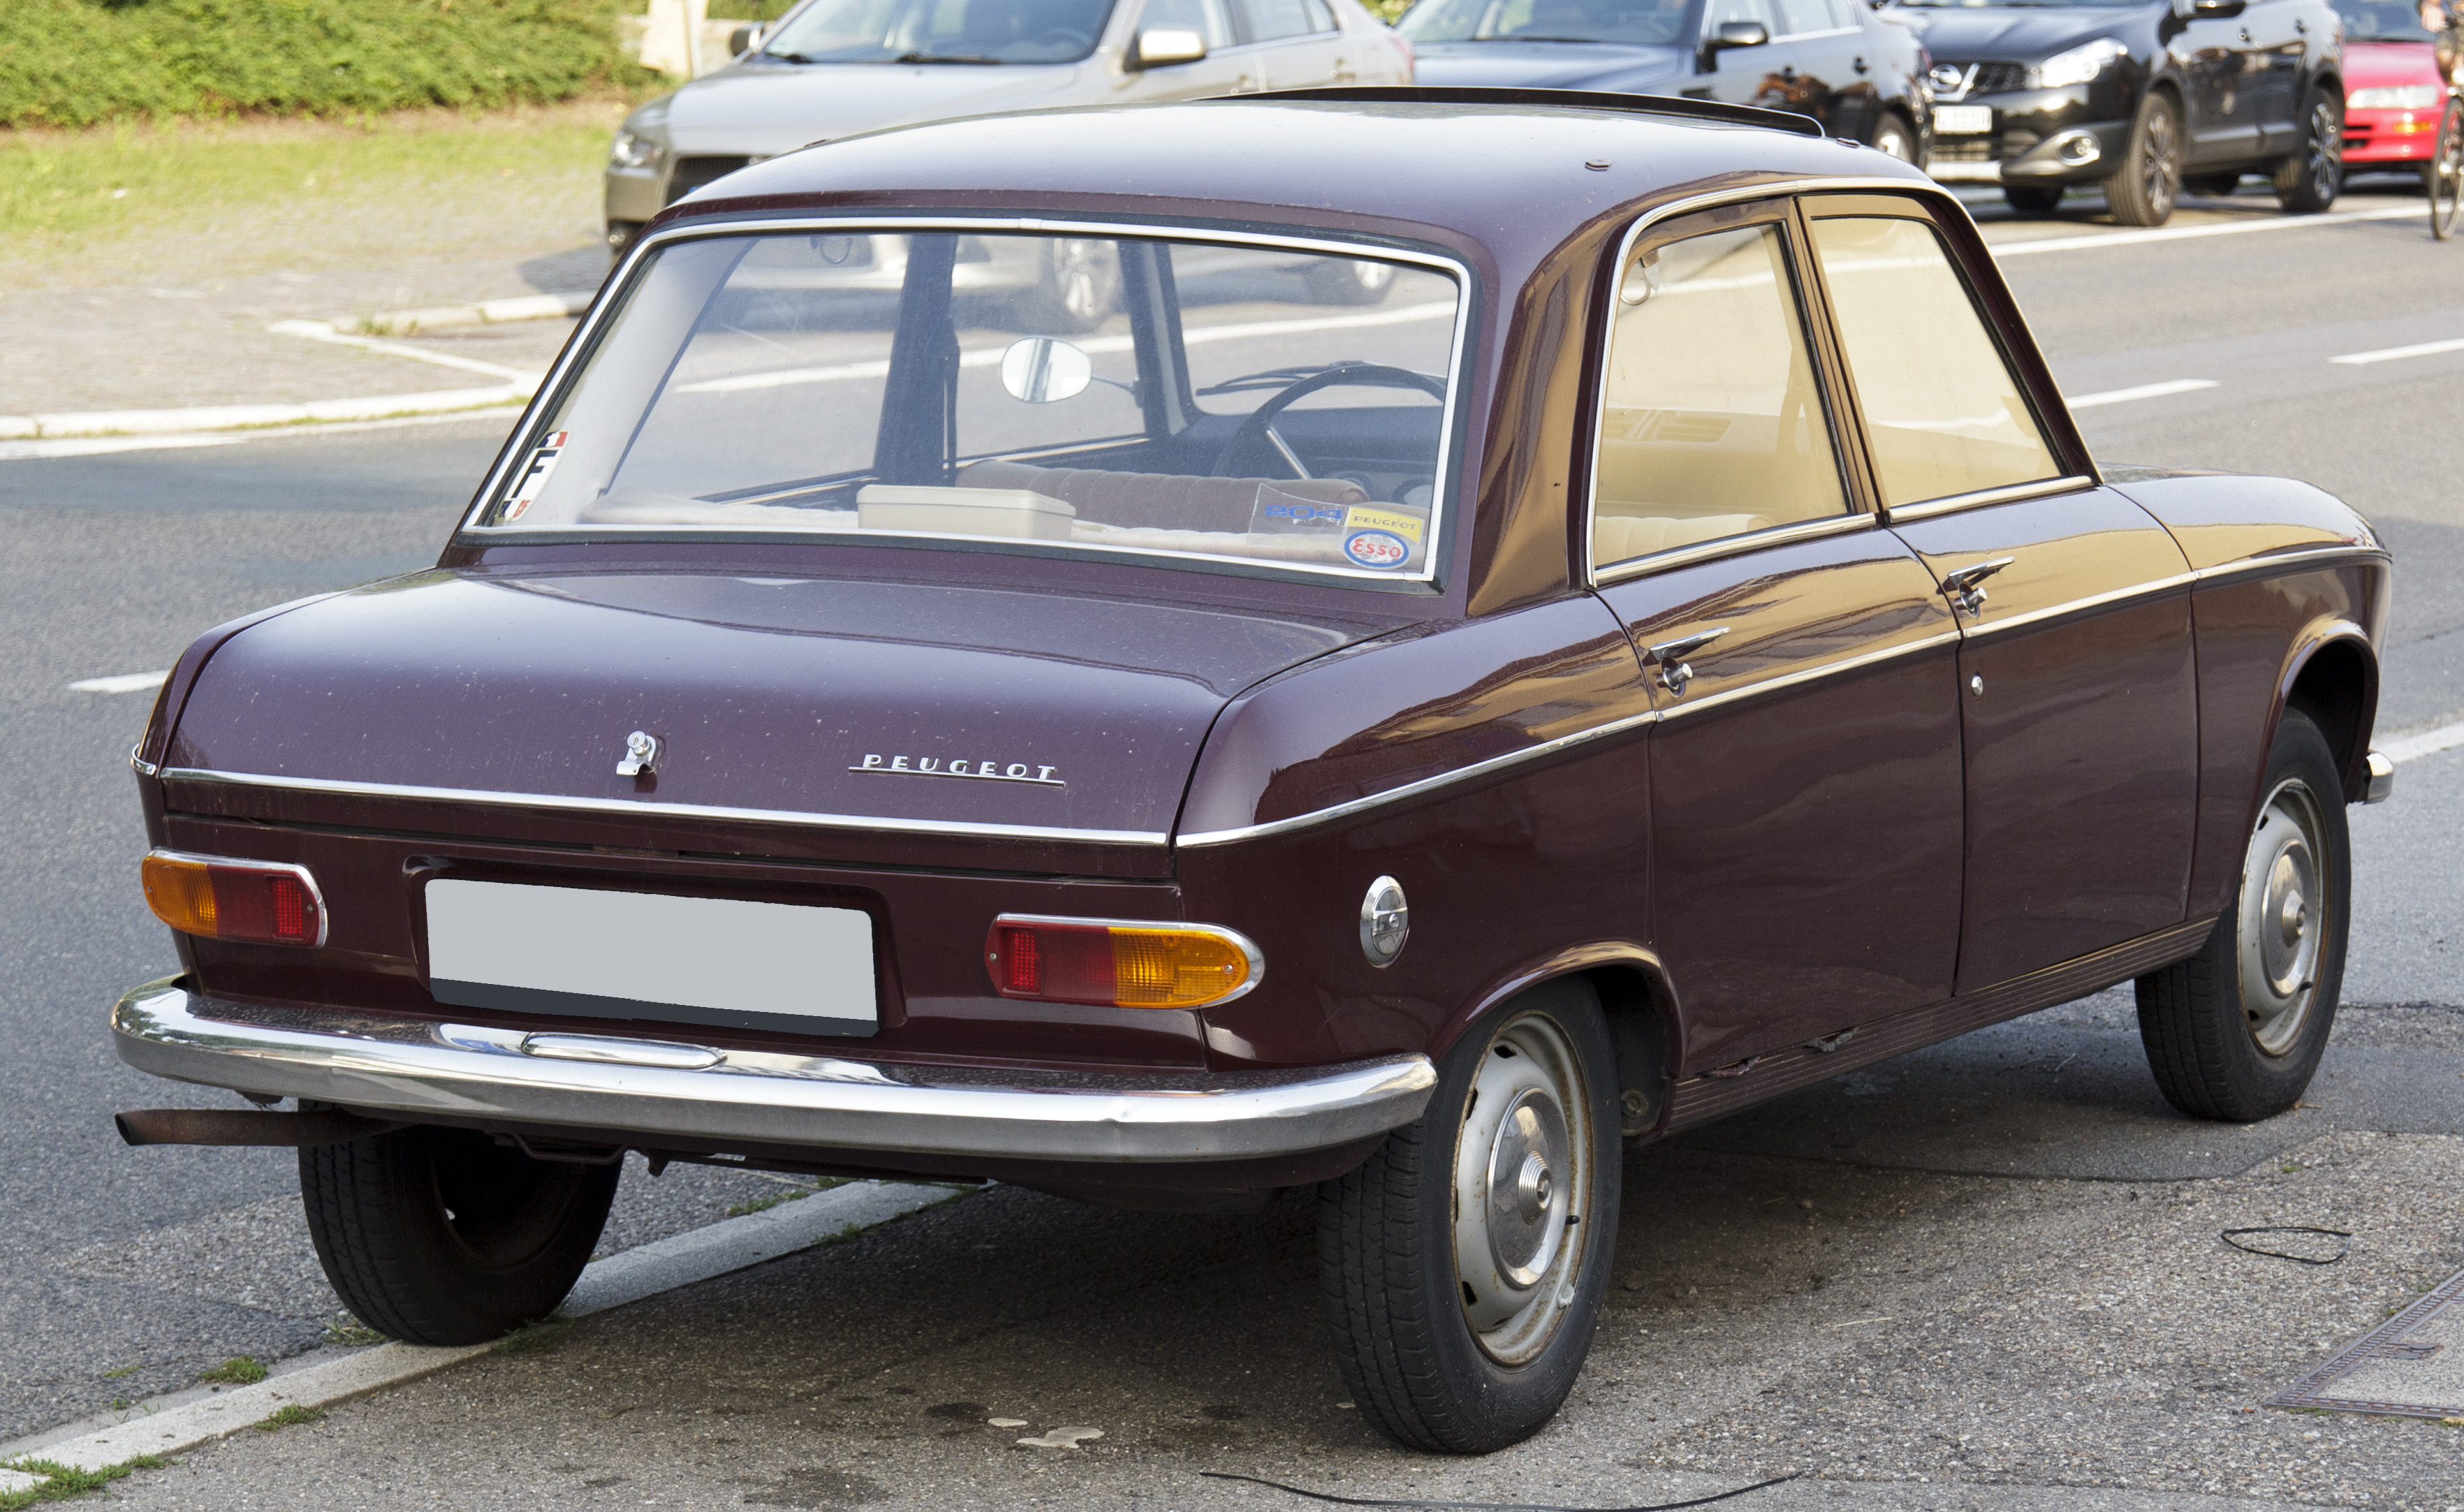 File:Peugeot 204 rear 20120630.jpg